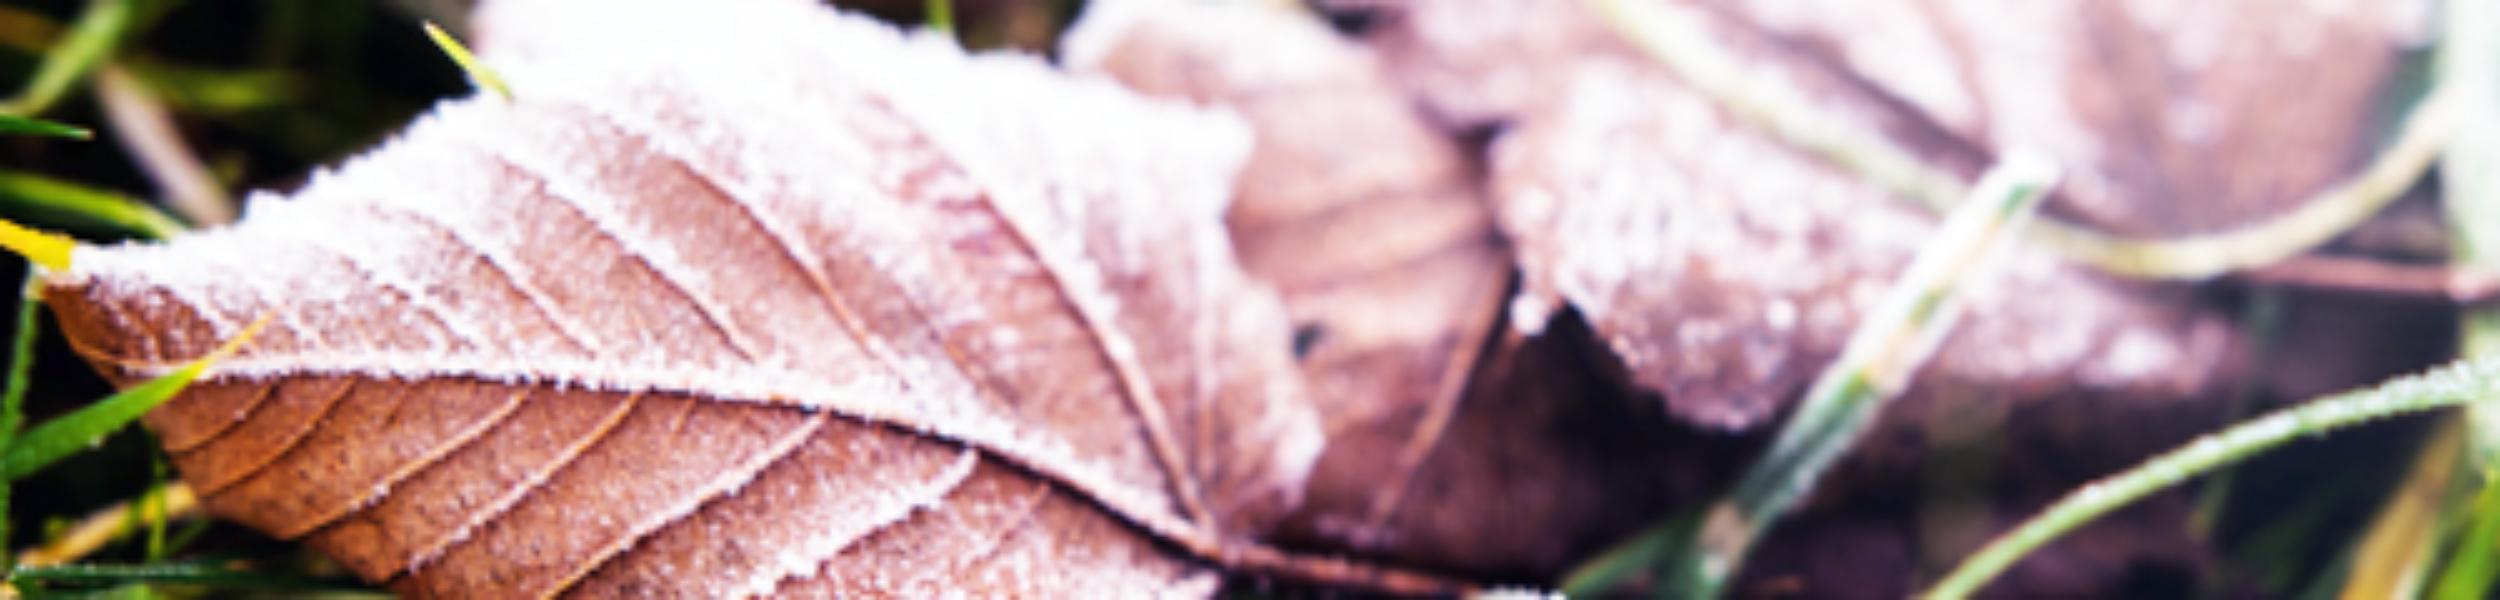 autumn slider leaves kcb